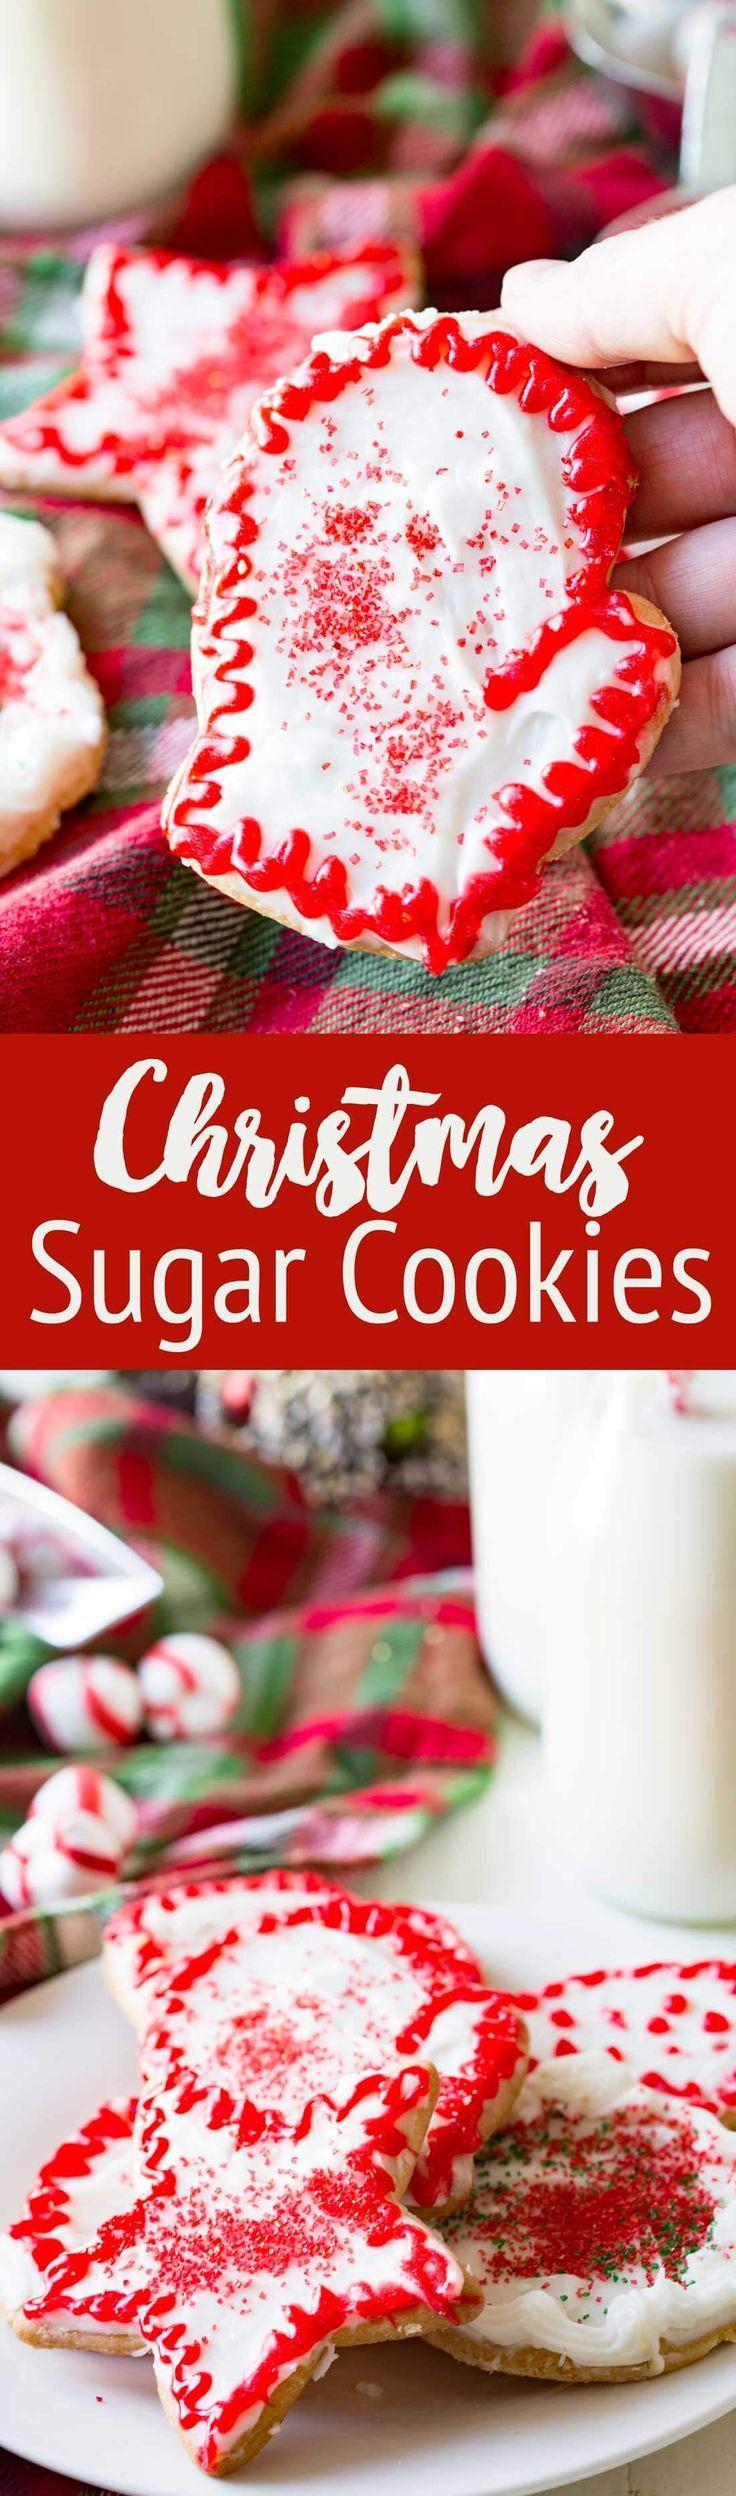 353 best Celebrate | Christmas Treats images on Pinterest ...